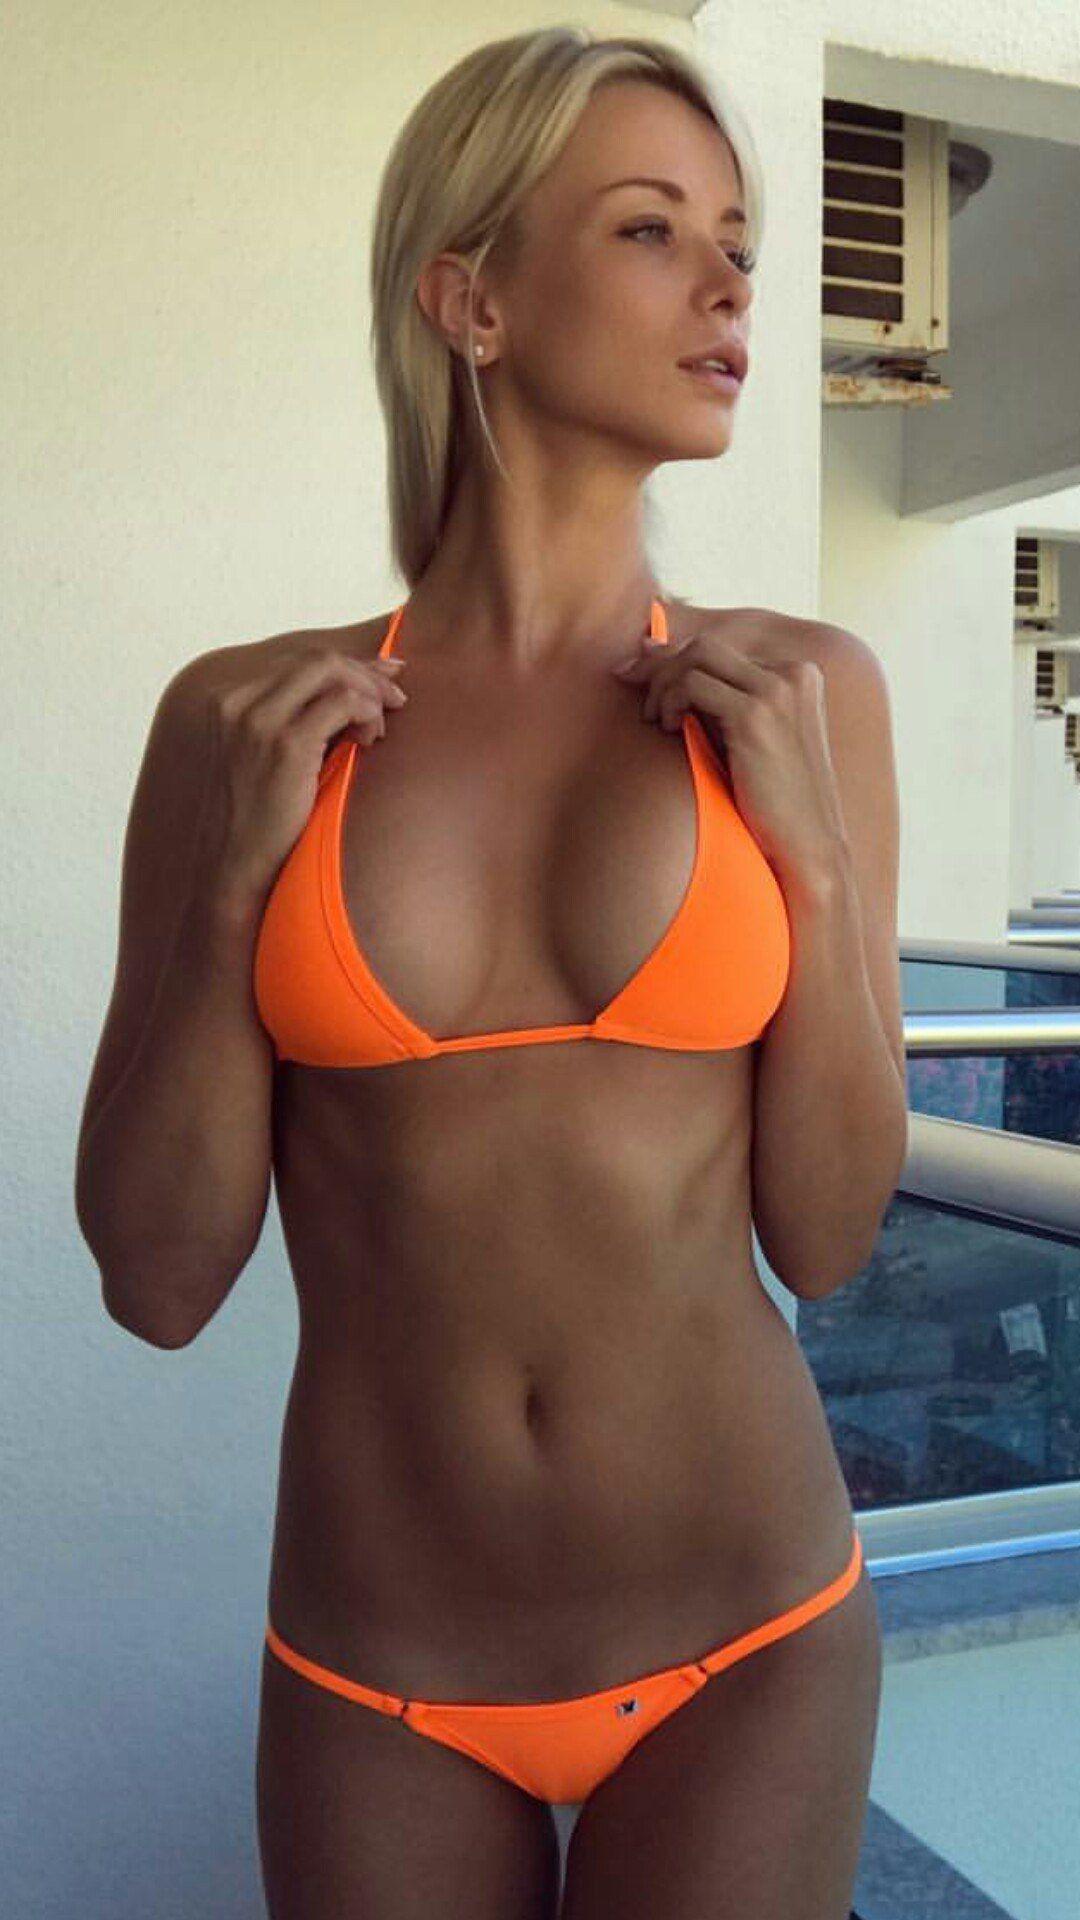 Charming Bikini Girls. Daily Pics. Sunny Beaches   Stylish Swimwear. Are  You Ready for the Summer  3dc63588a8